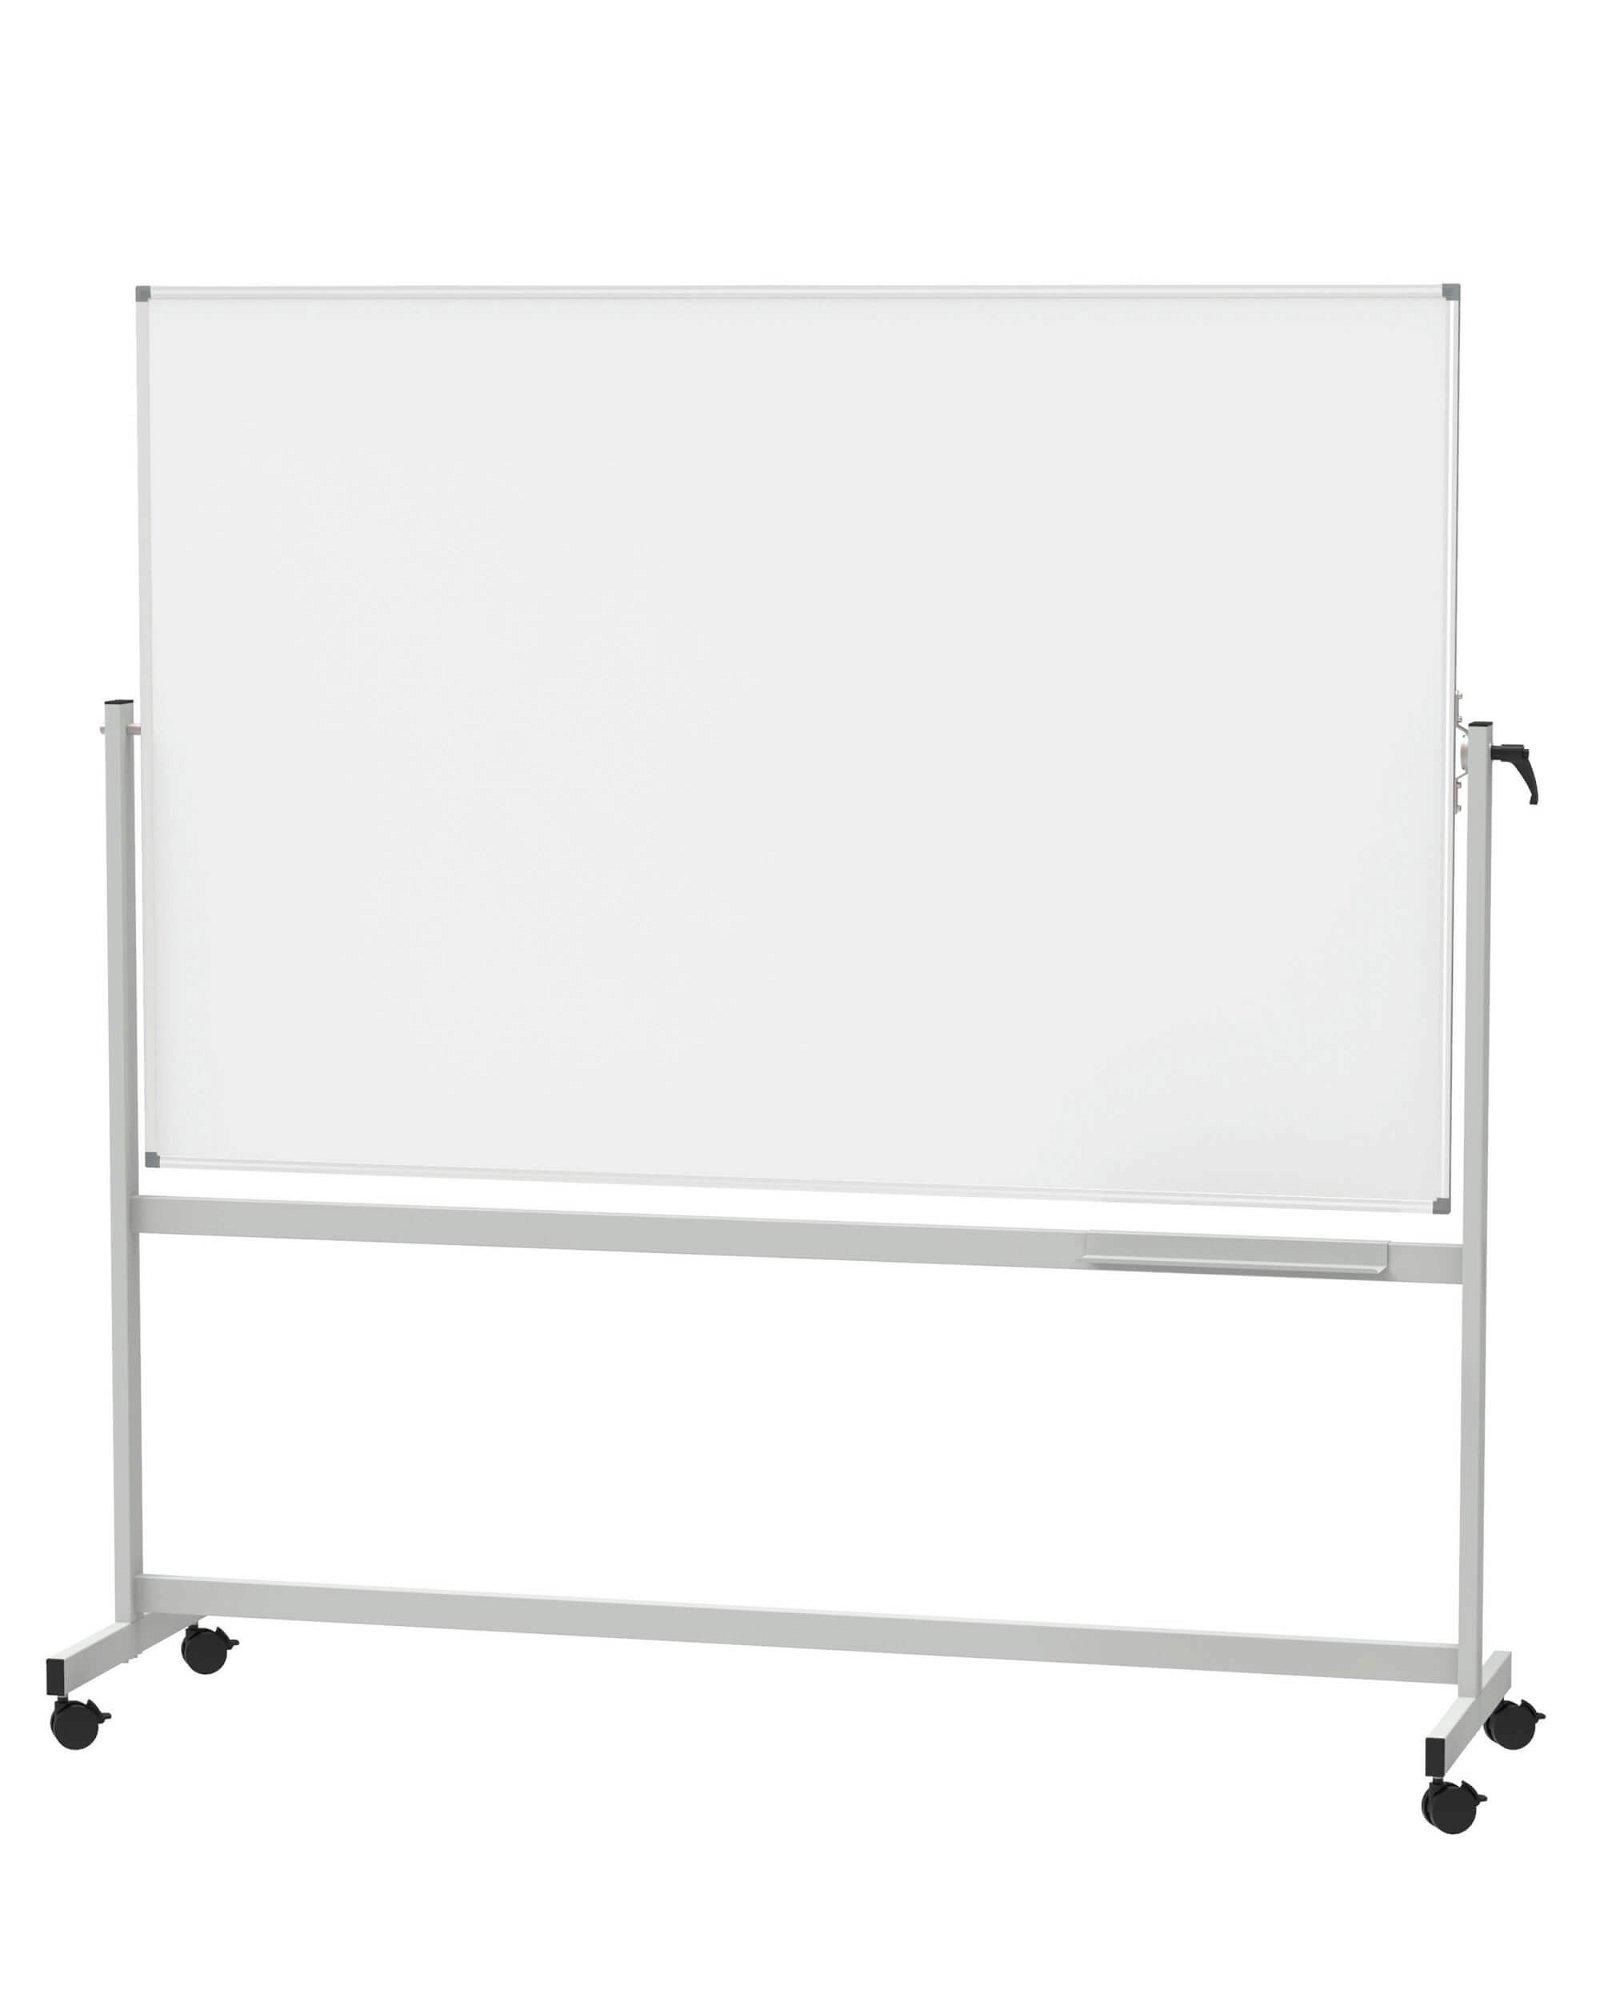 Mobiles Whiteb. MAULstandard, drehbar, Emaille, 120x180 cm, grau